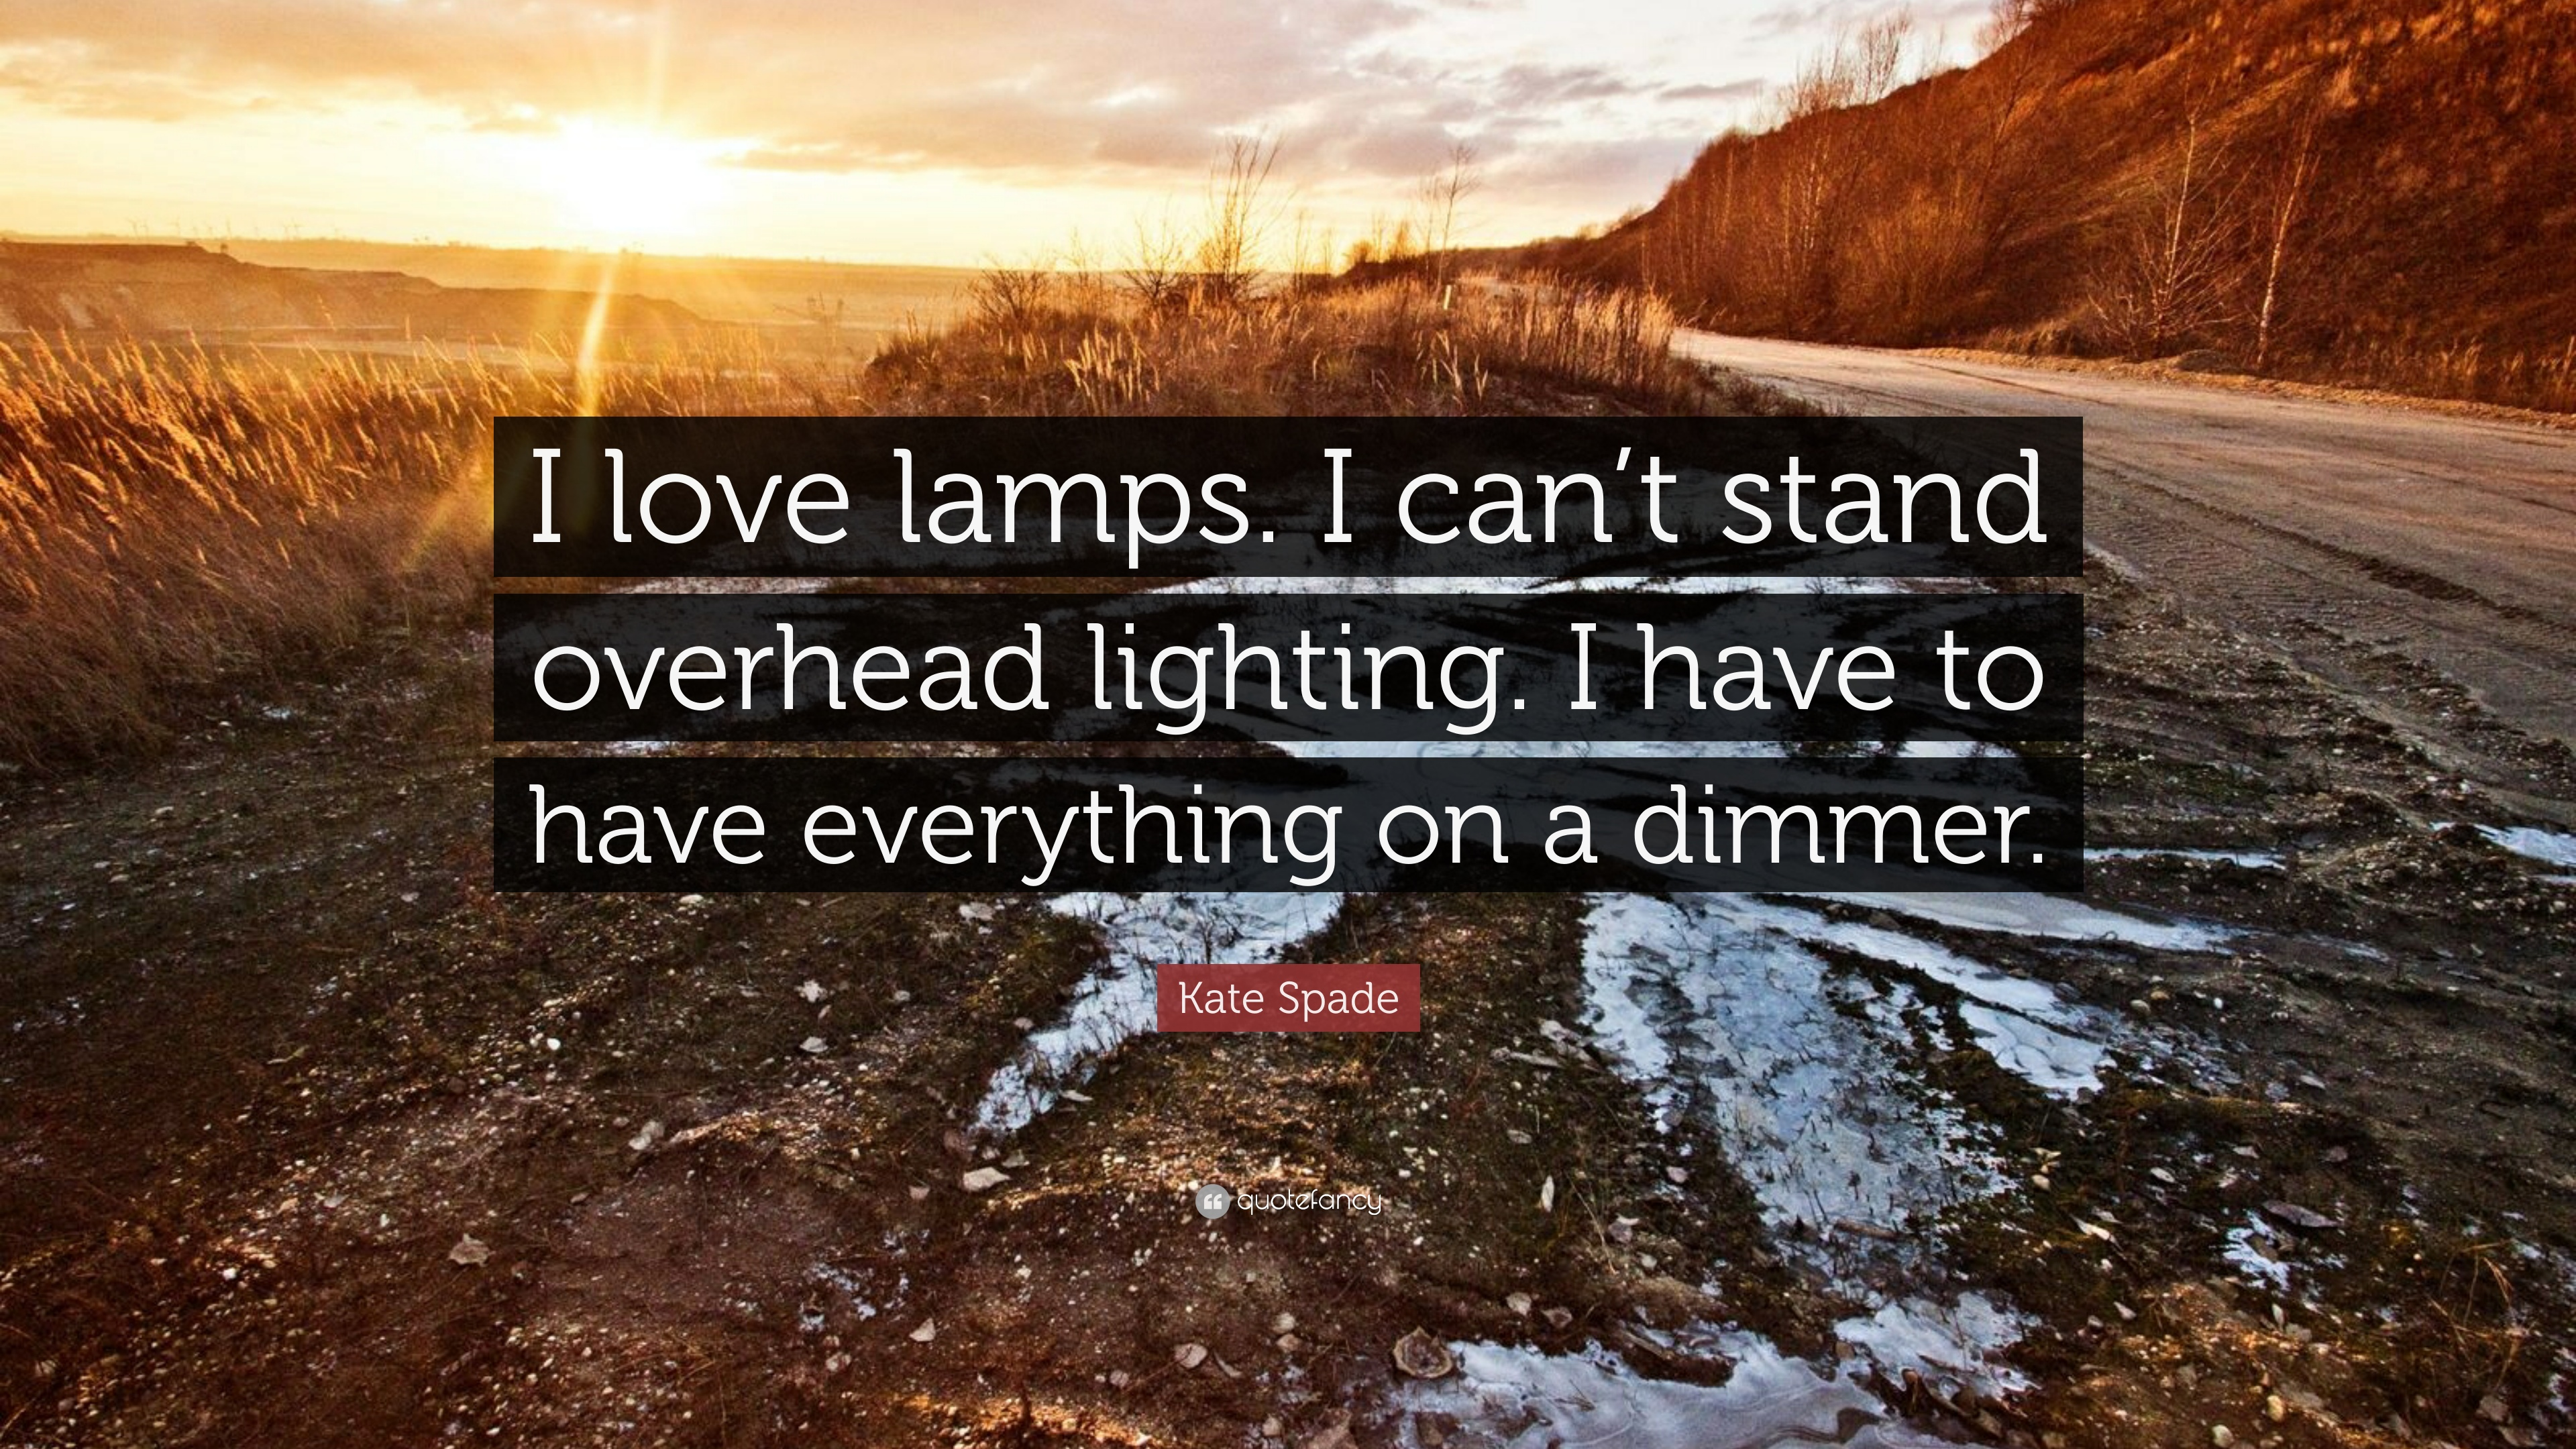 Kate Spade Quote: U201cI Love Lamps. I Canu0027t Stand Overhead Lighting